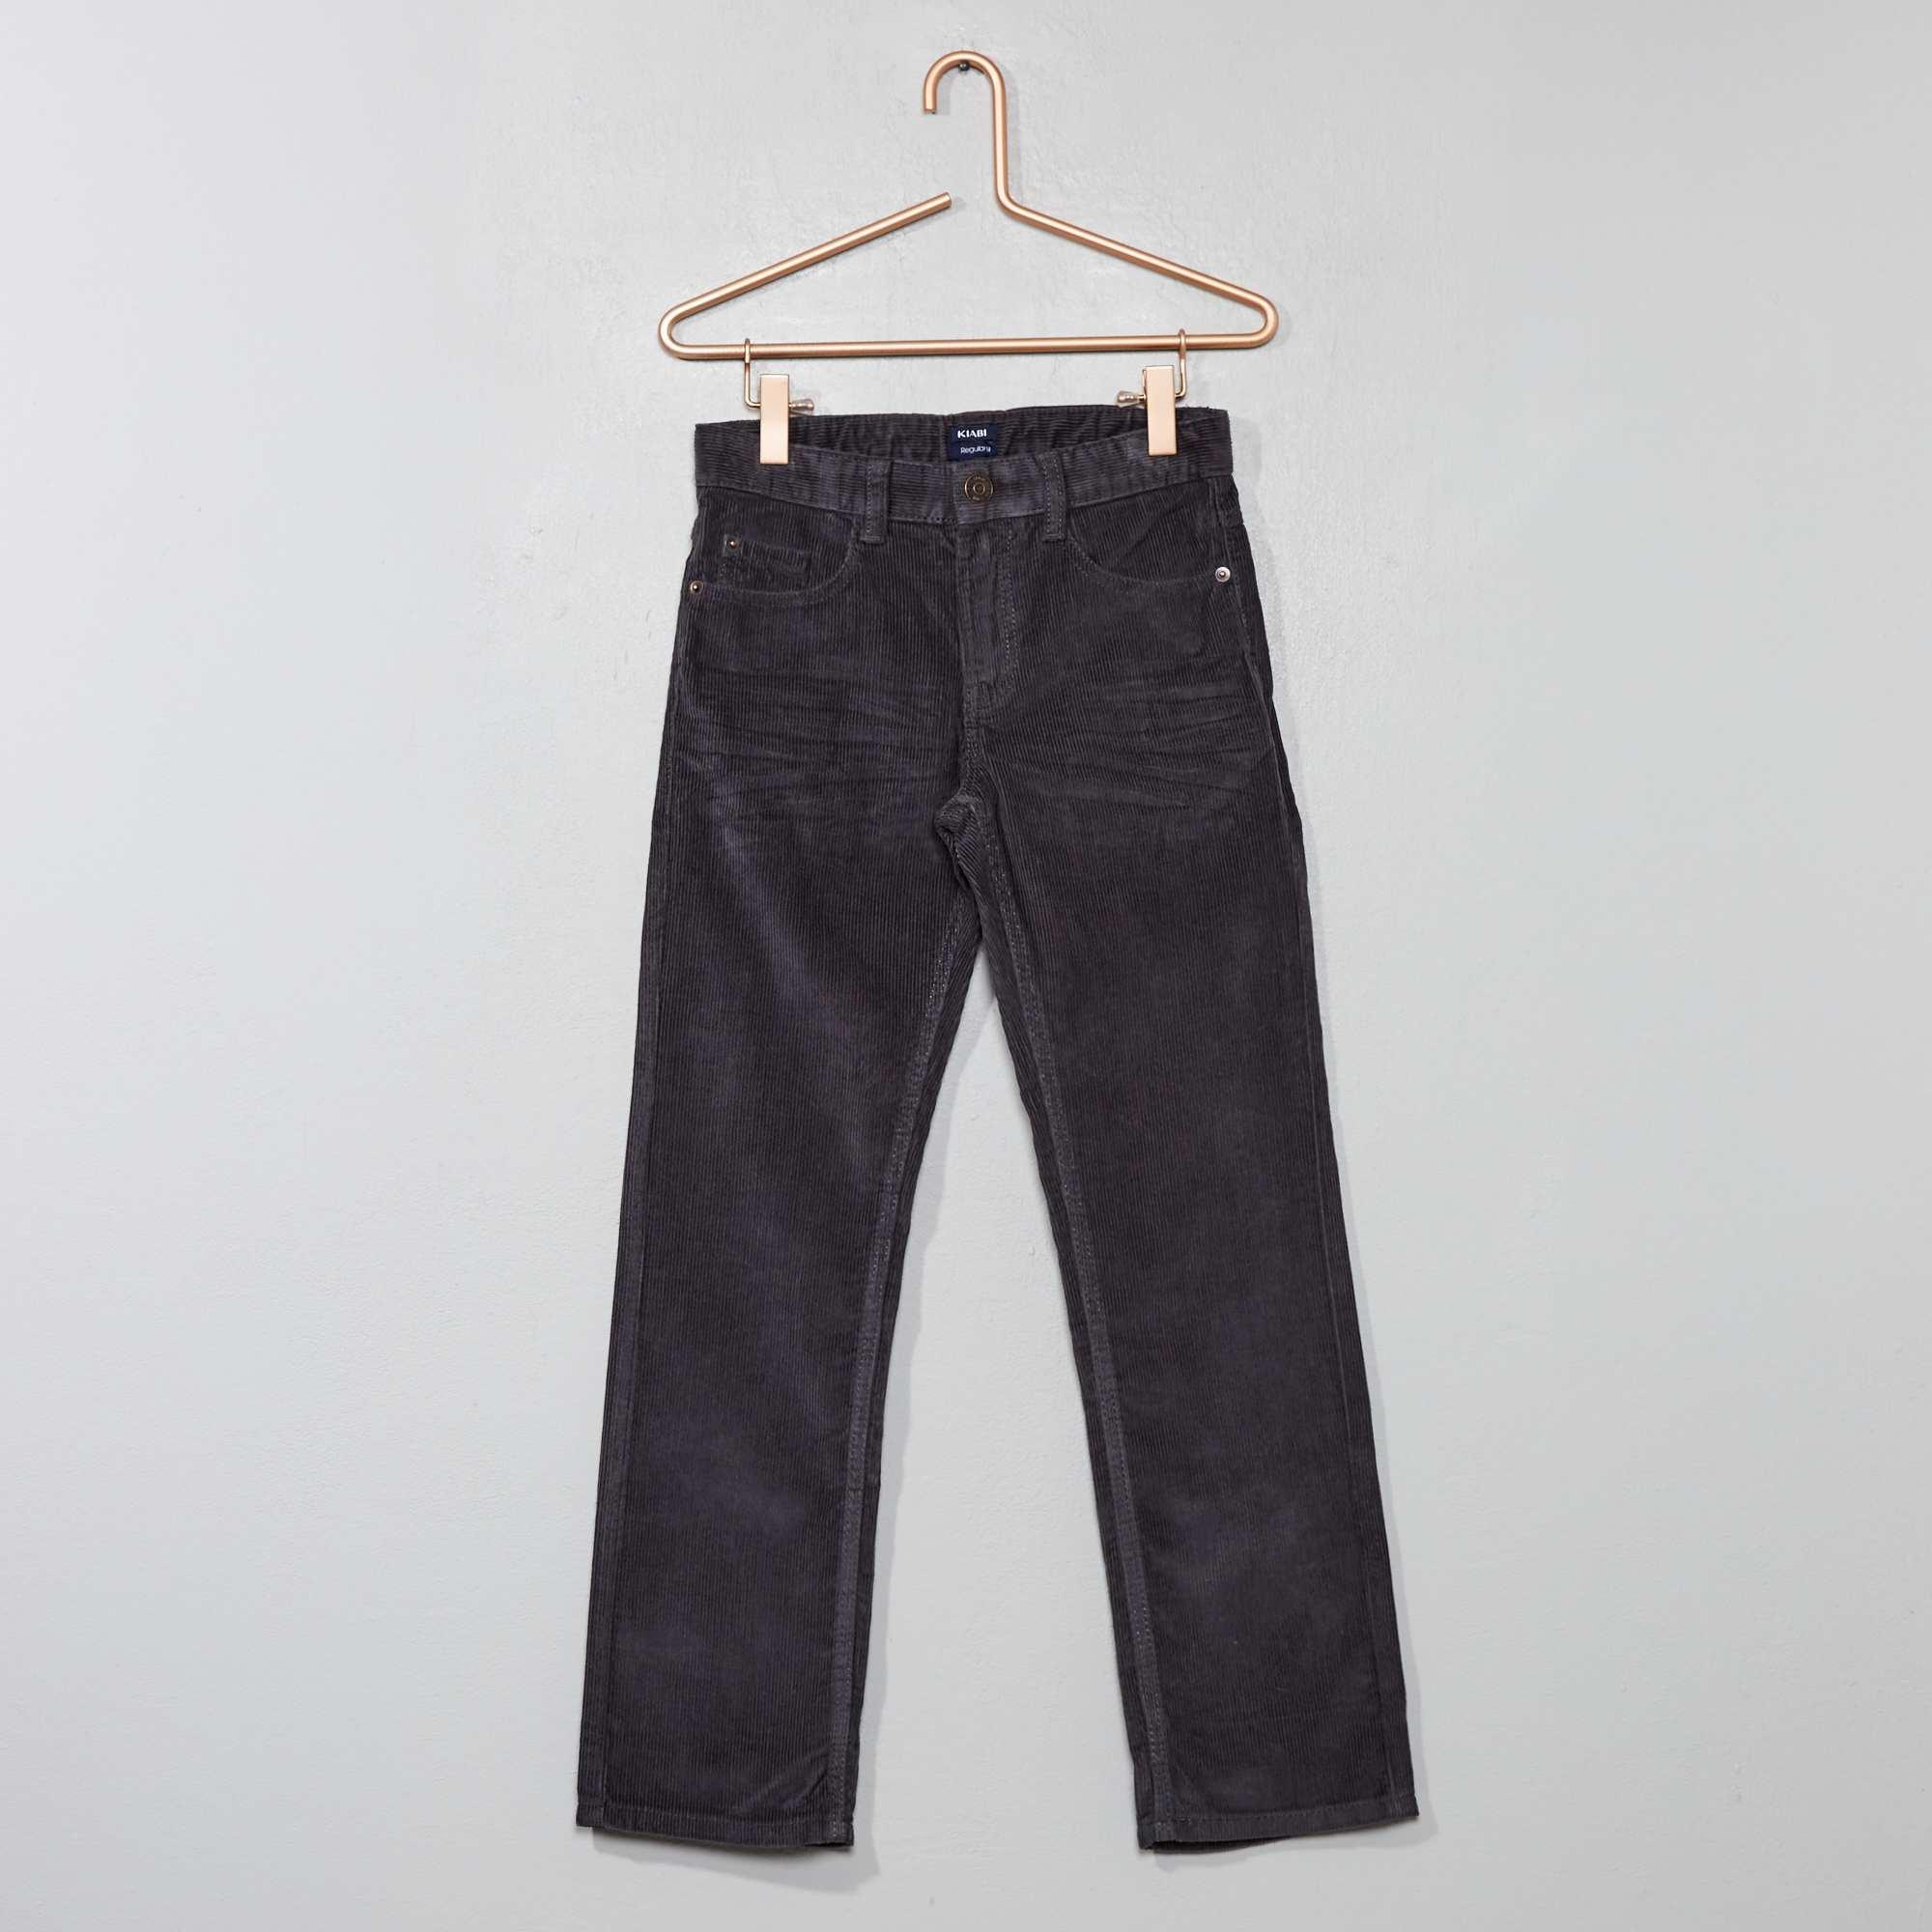 f18e6159d47d9 Pantalon en velours côtelé Garçon - gris - Kiabi - 6,00€